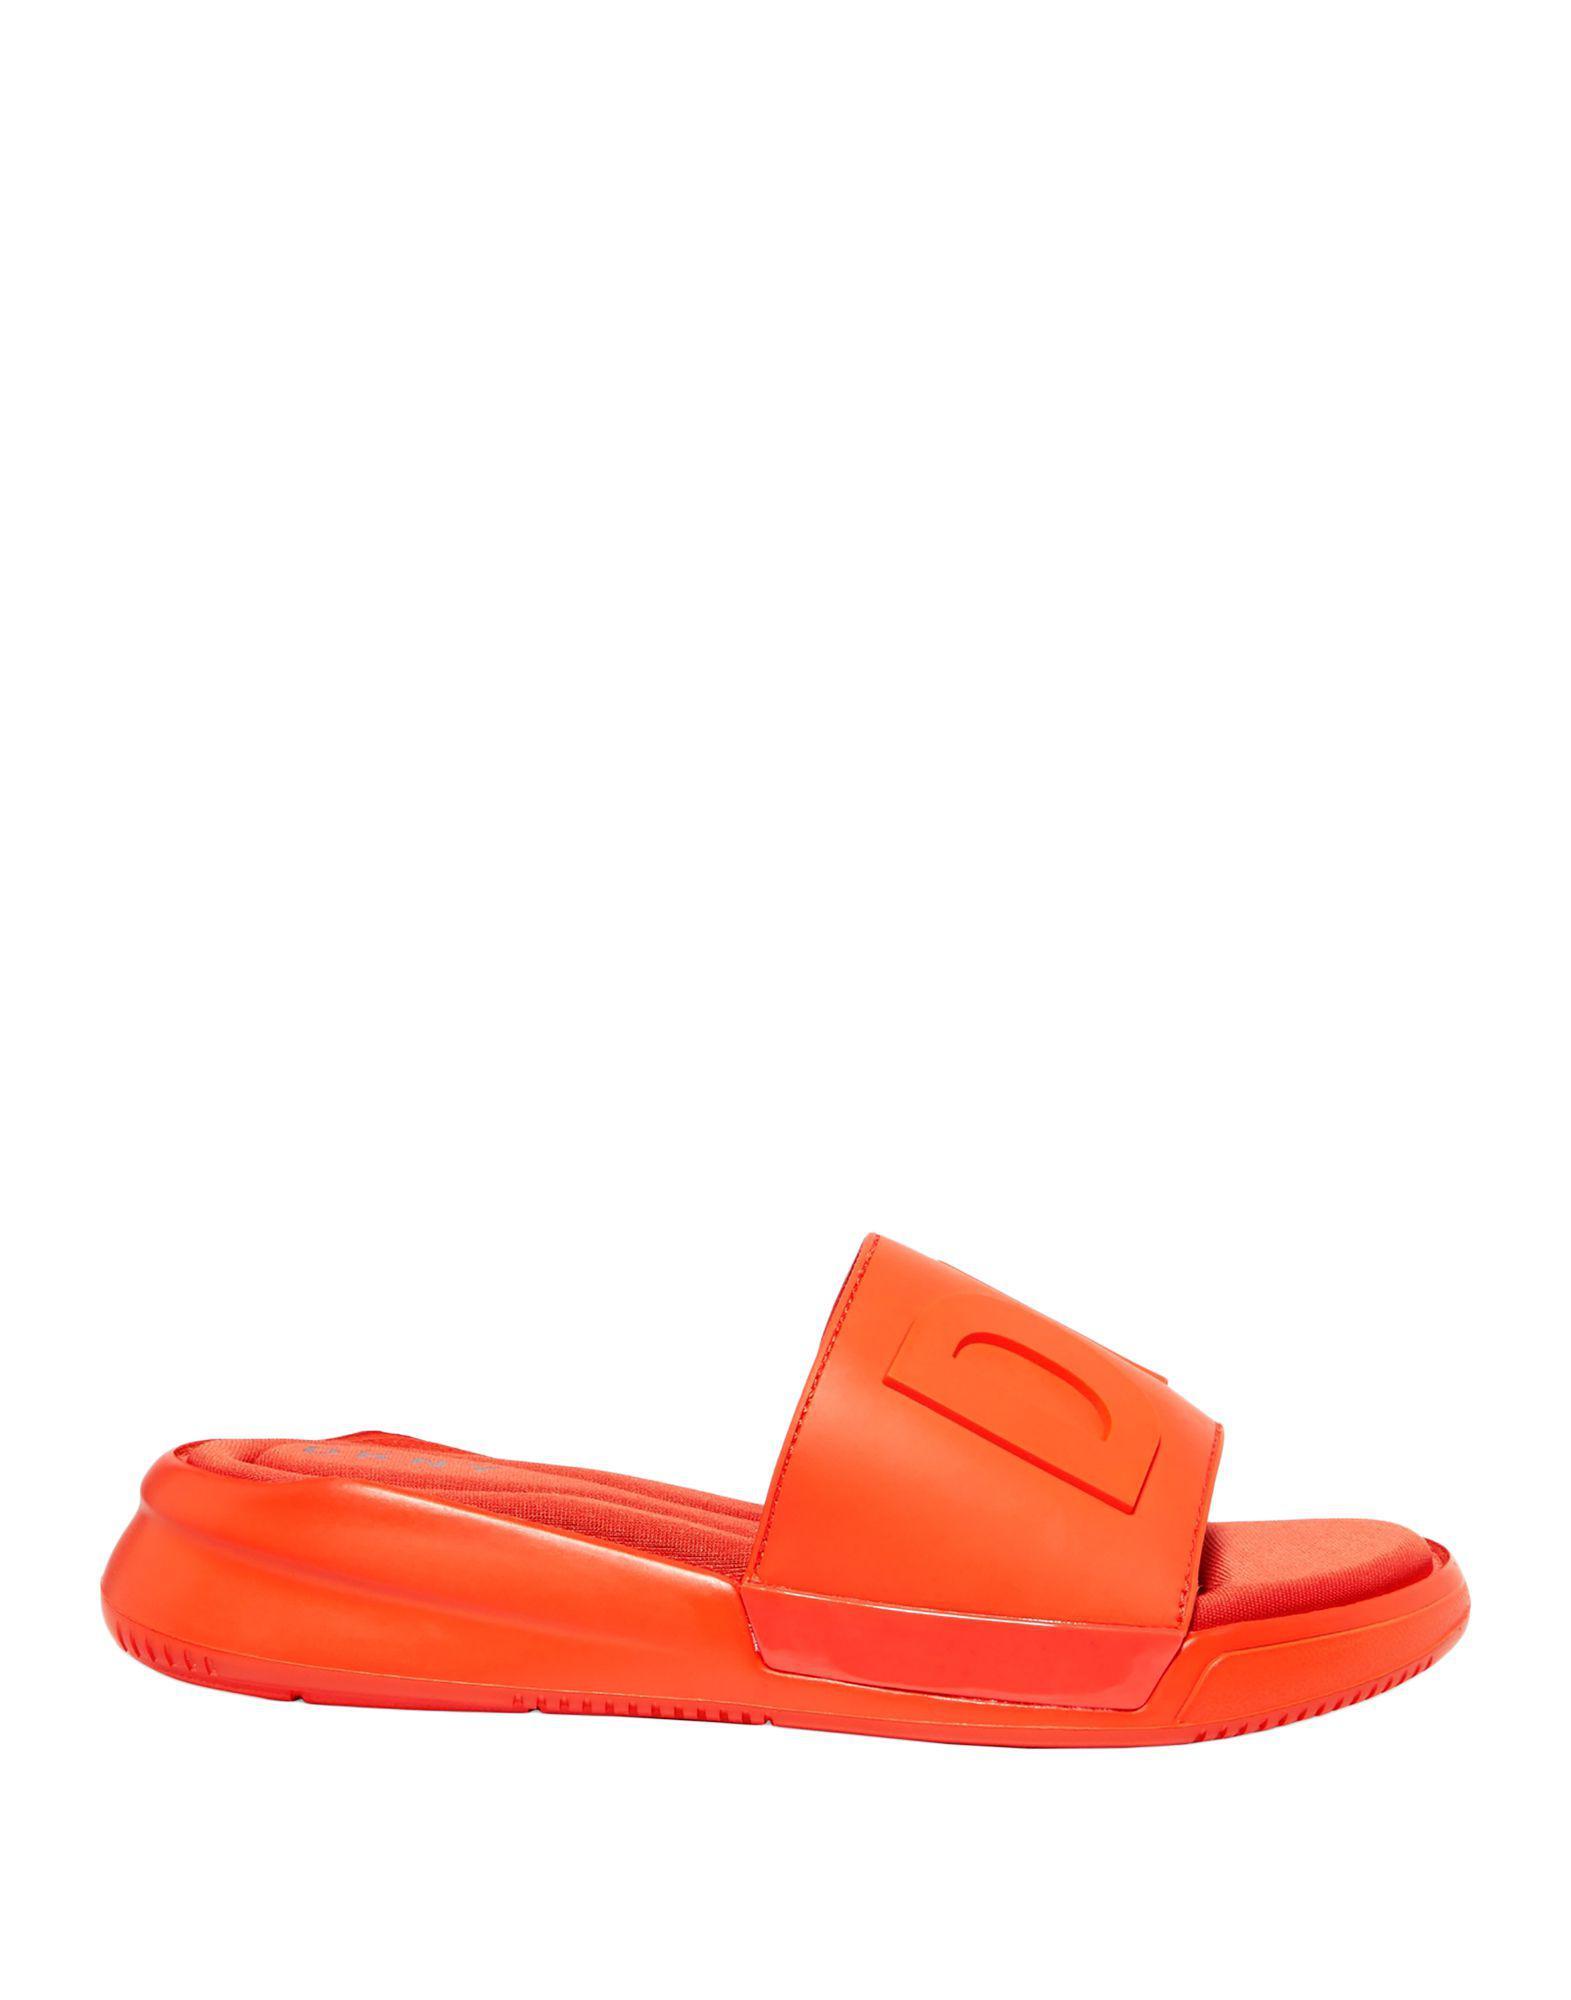 9f369174afd Lyst - Dkny Sandals in Orange